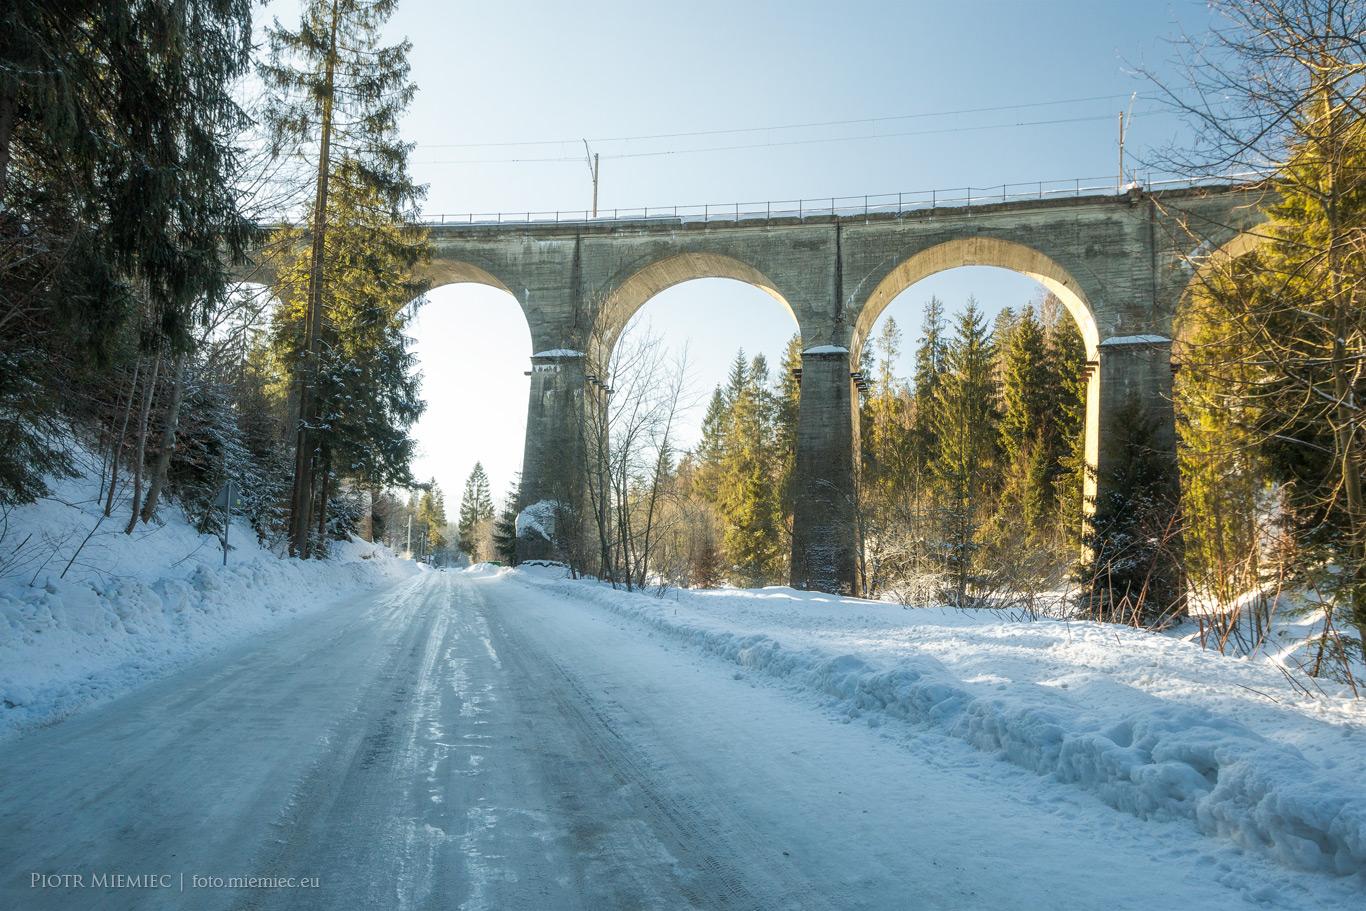 Wiadukt kolejowy w Wiśle